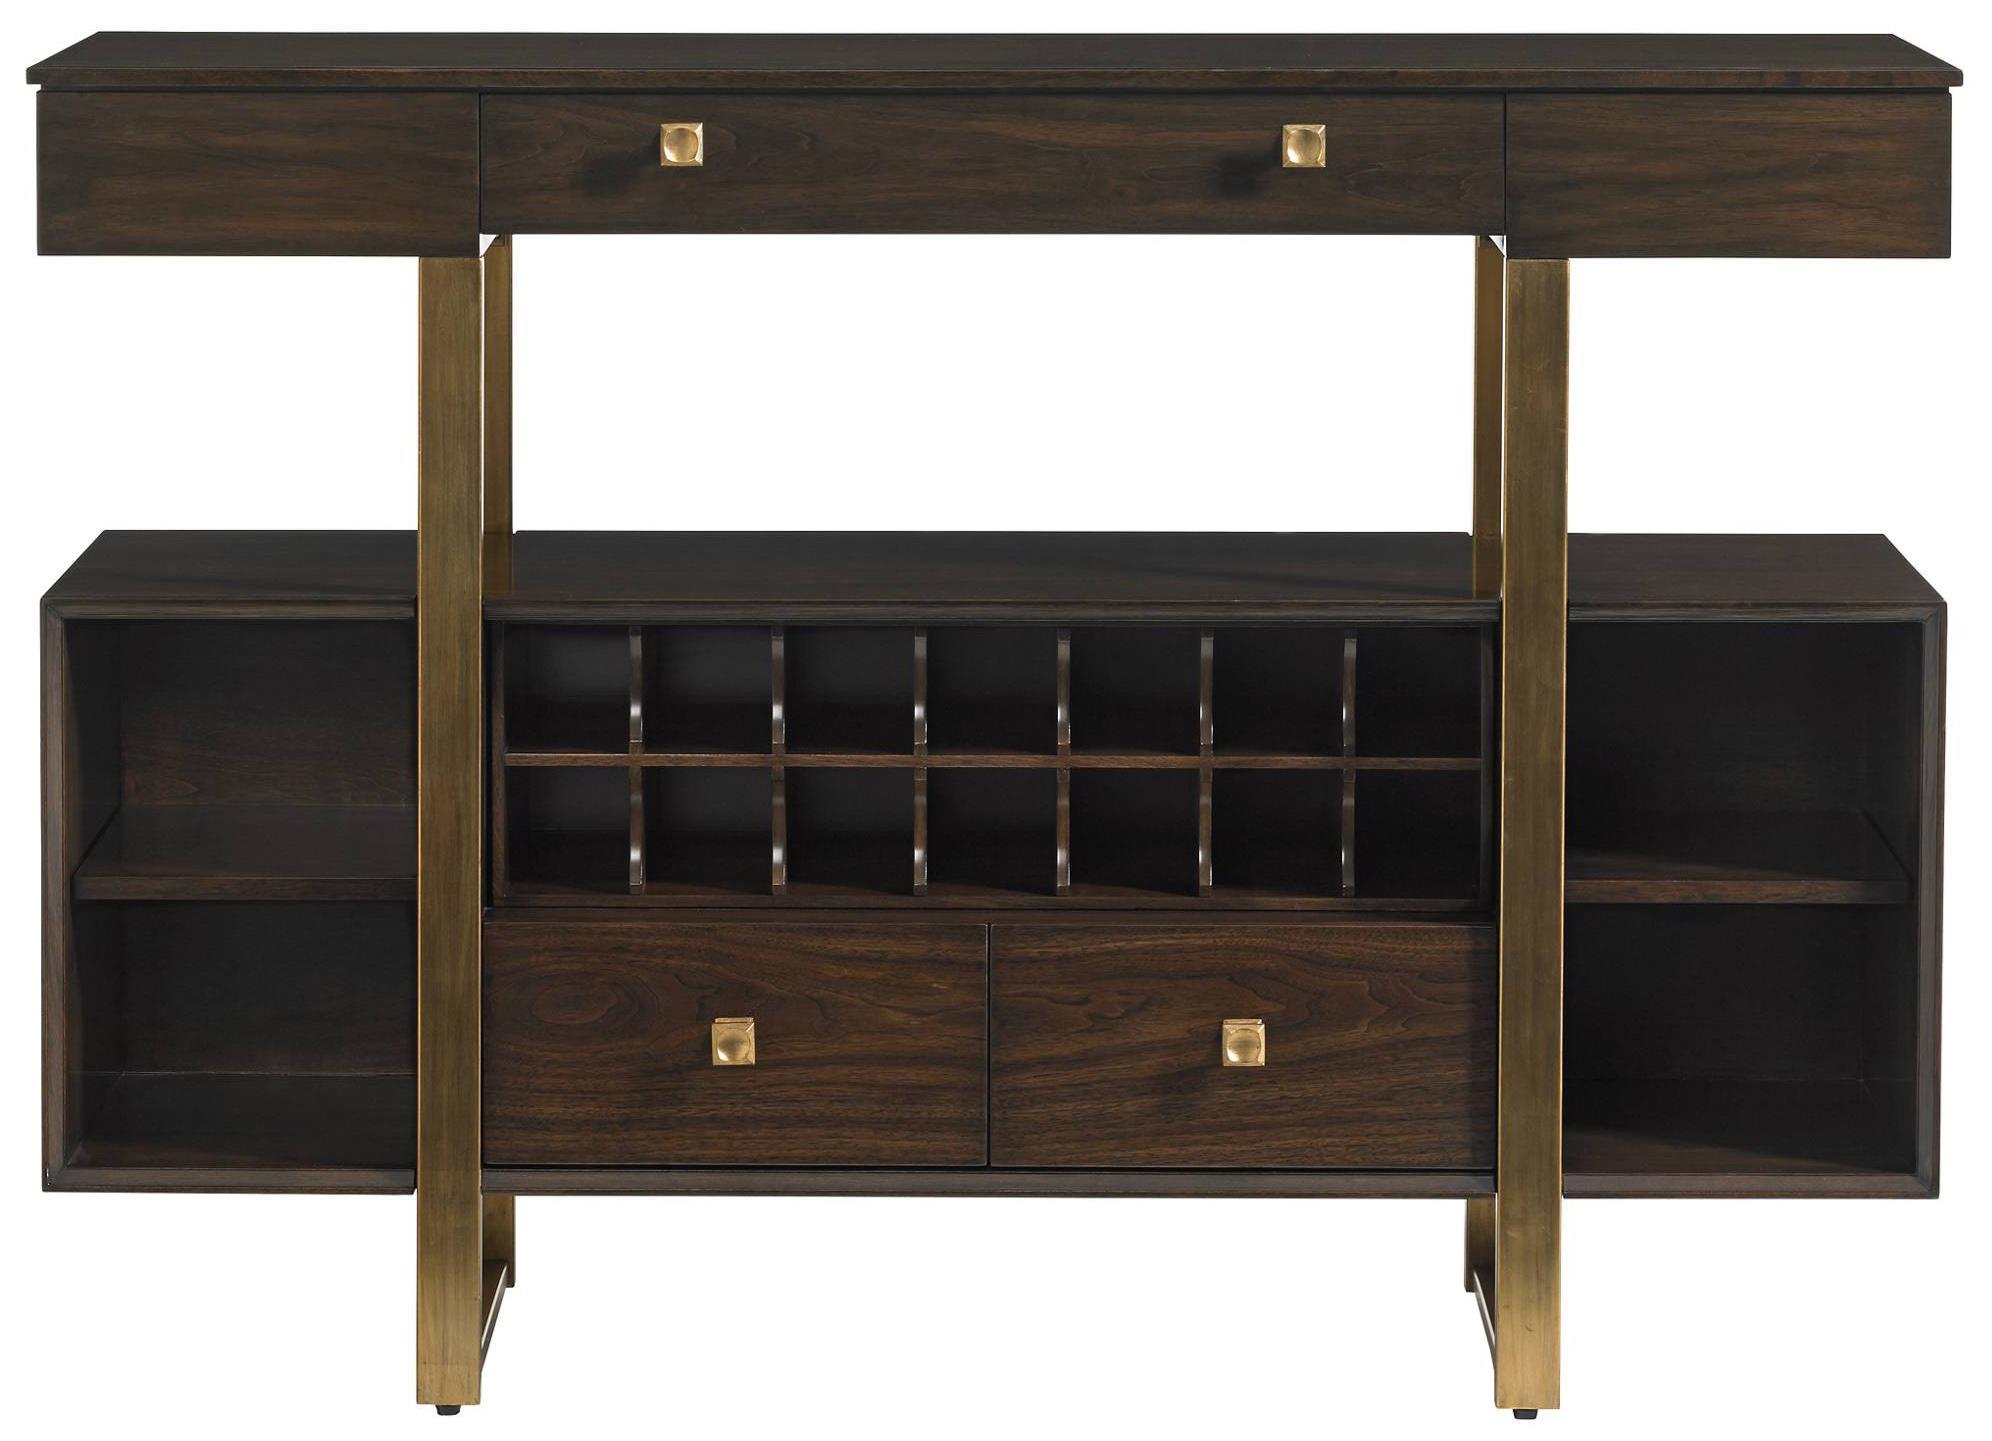 Stanley Furniture Crestaire Crosley Sideboard - Item Number: 436-11-06